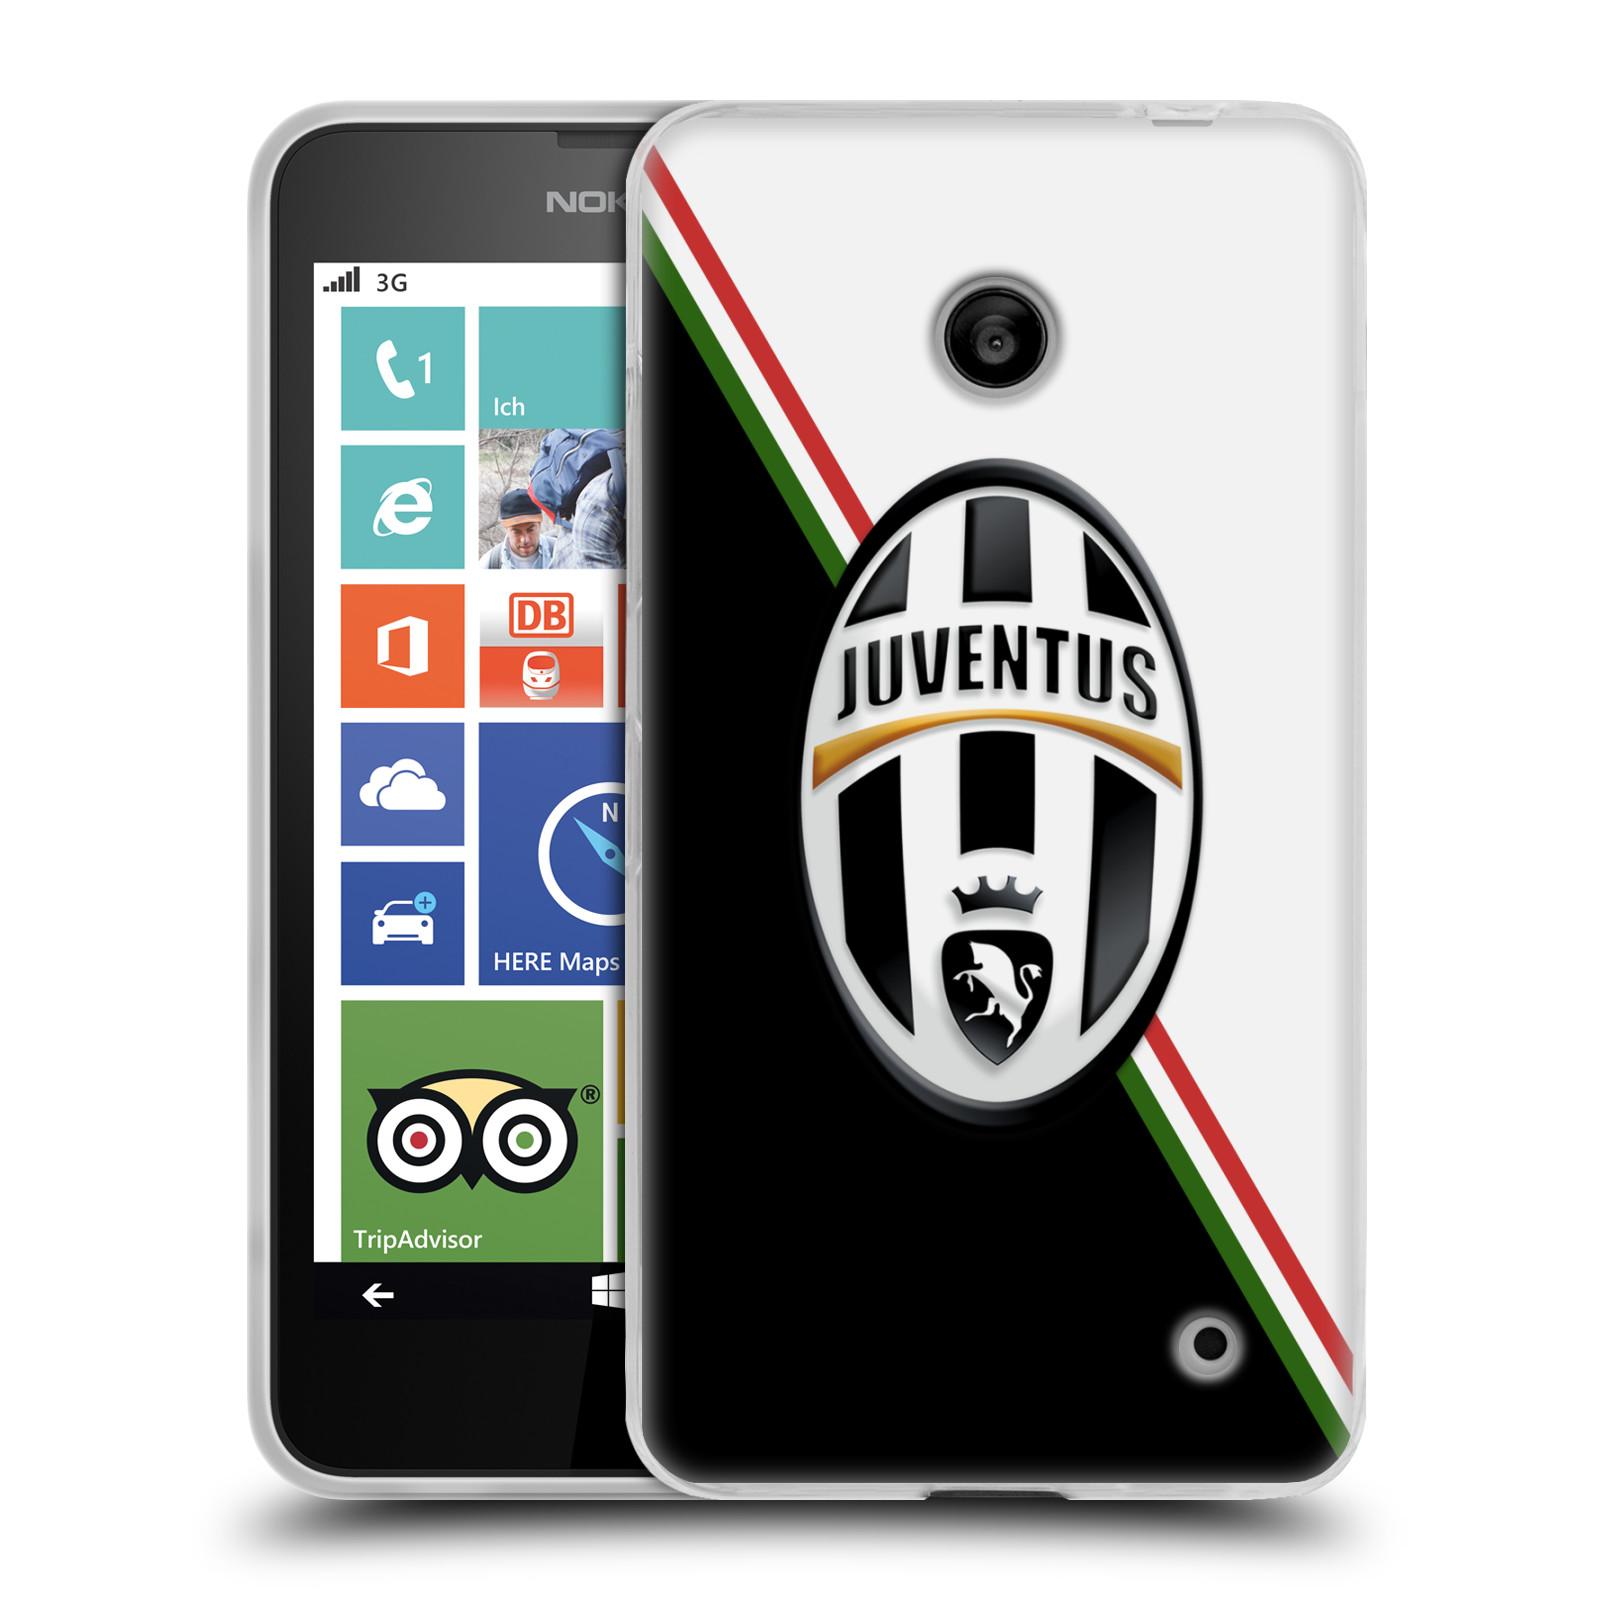 Silikonové pouzdro na mobil Nokia Lumia 630 HEAD CASE Juventus FC - Black and White (Silikonový kryt či obal na mobilní telefon Juventus FC Official pro Nokia Lumia 630 a Nokia Lumia 630 Dual SIM)